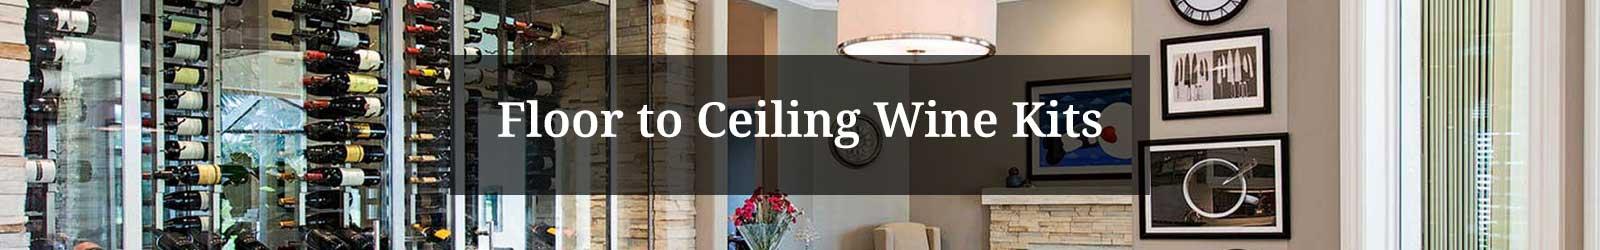 Floor to Ceiling Wine Kits